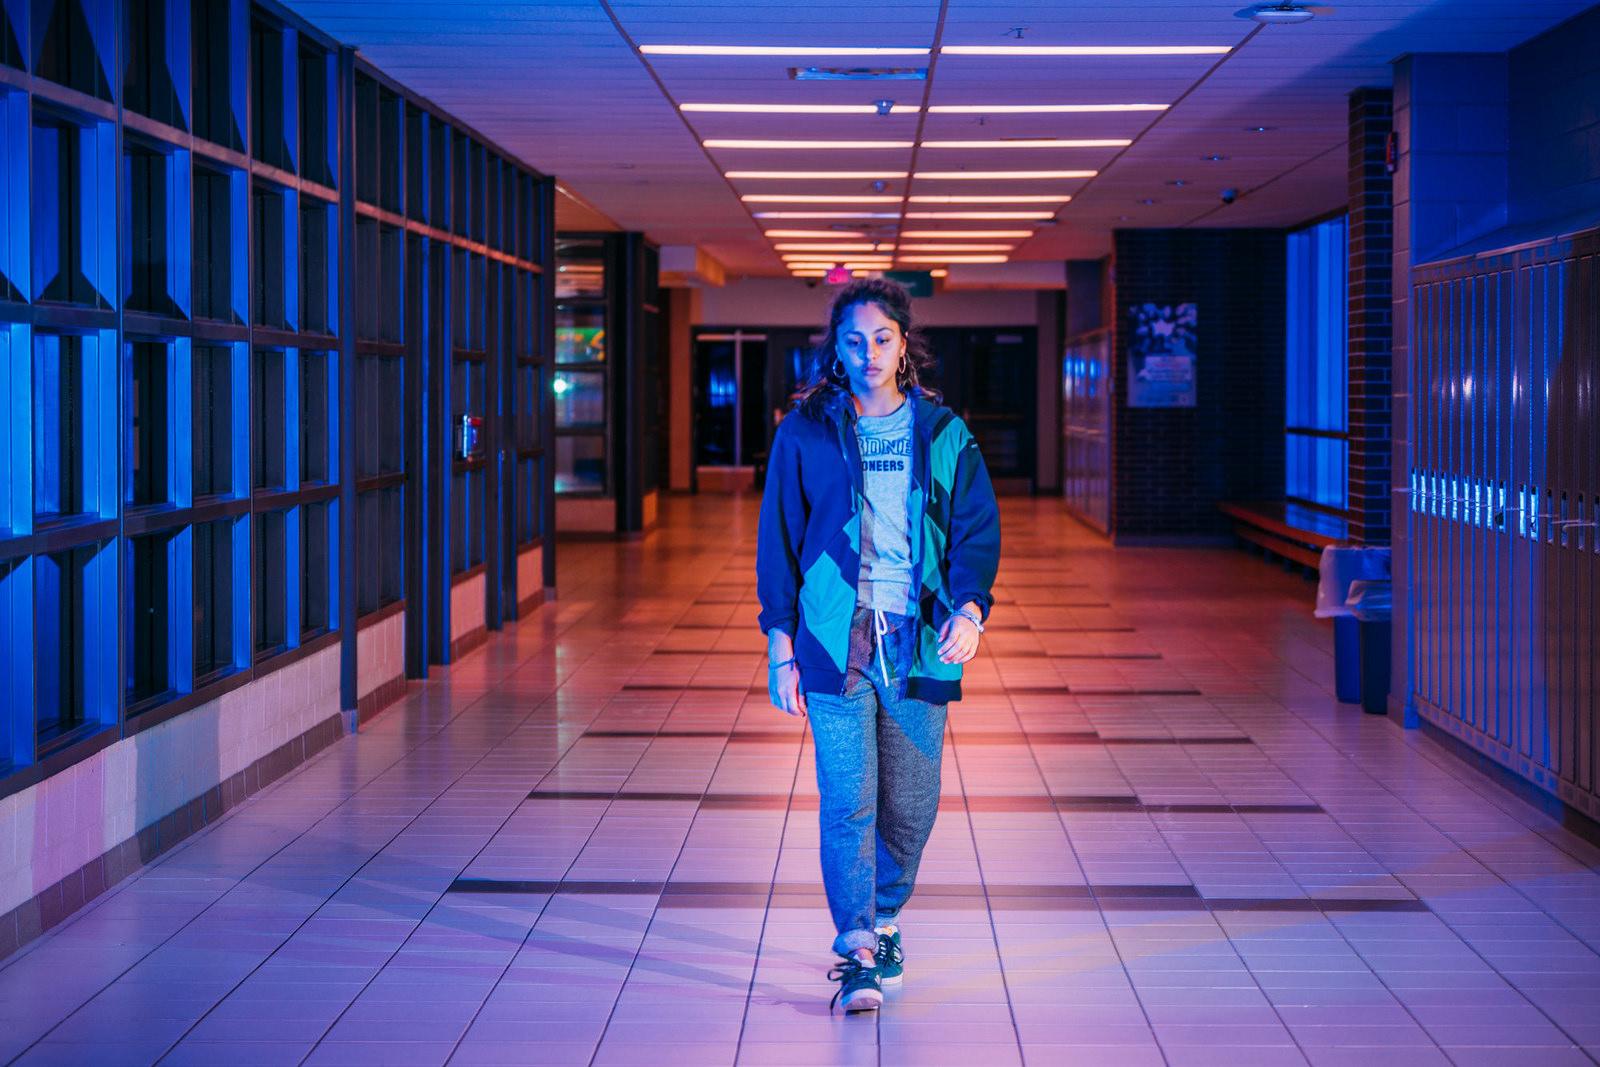 Rhianne Barreto as Mandy in SHARE. Photo courtesy of A24 Films.